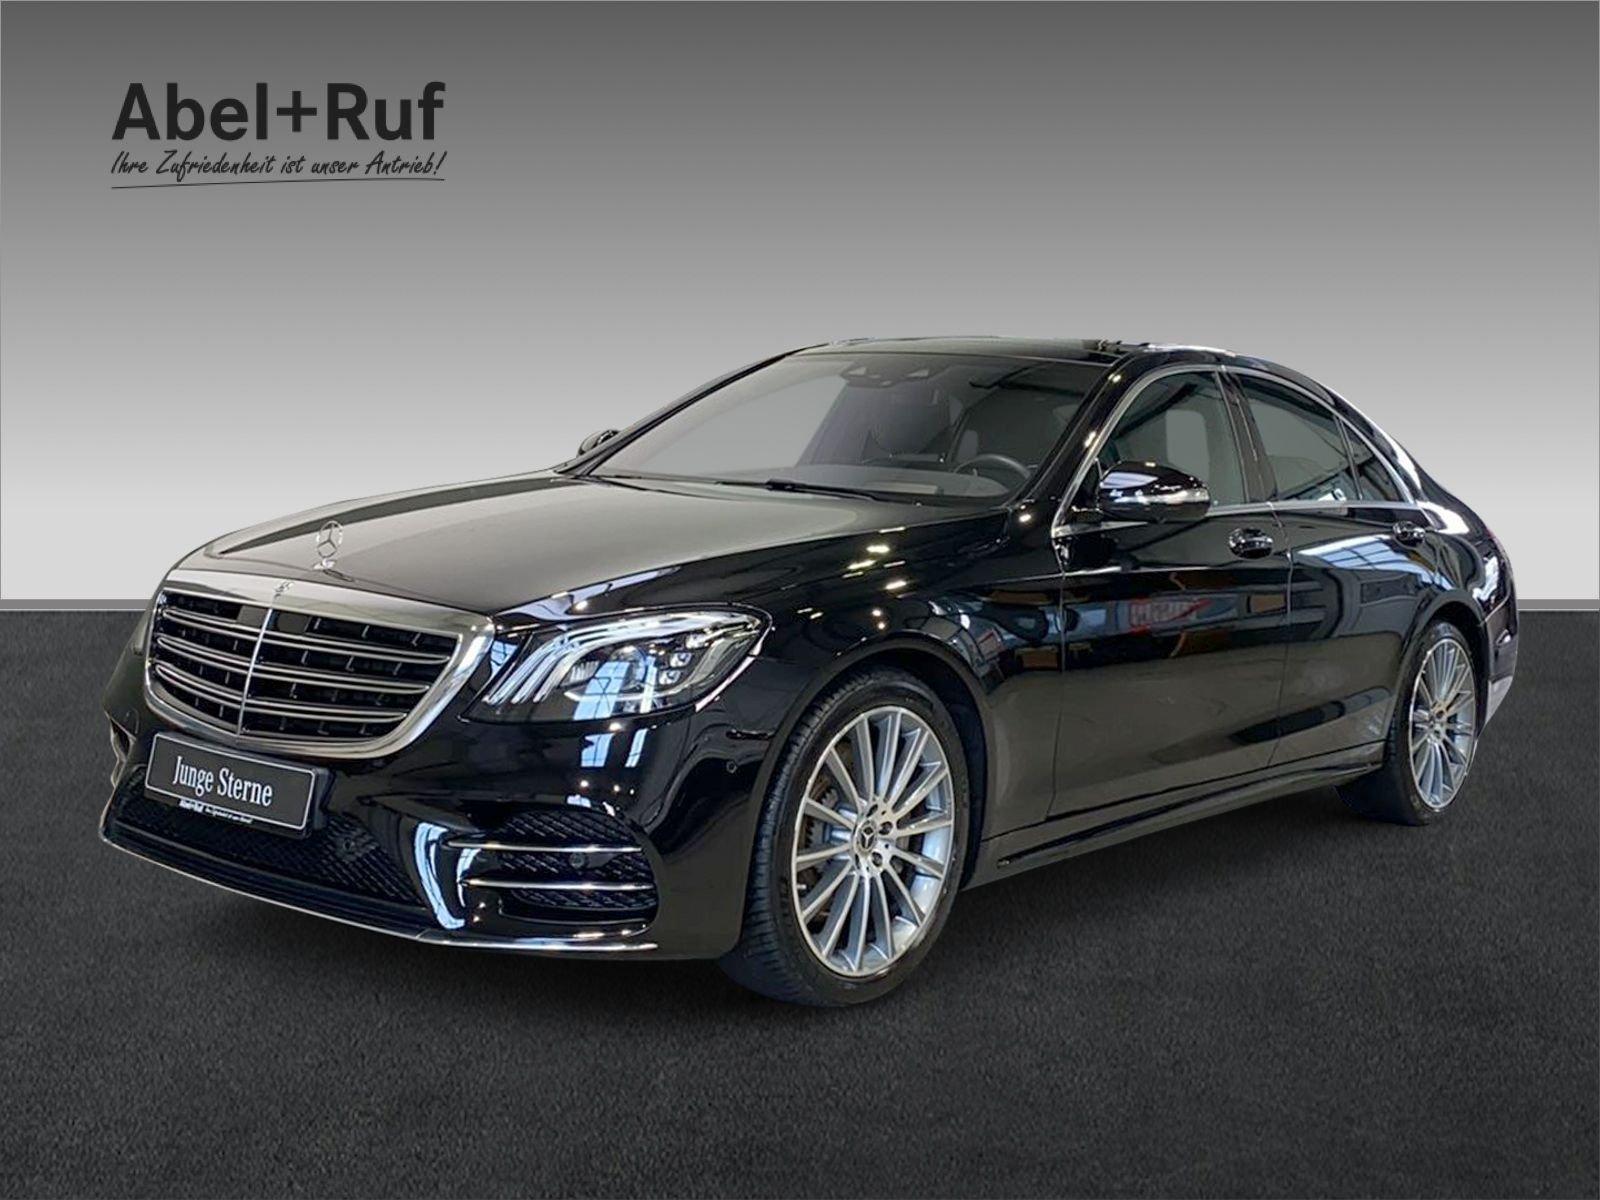 Mercedes-Benz S 400d+AMG+MULTIBEAM+Burmester+Pano+360°+20, Jahr 2018, Diesel